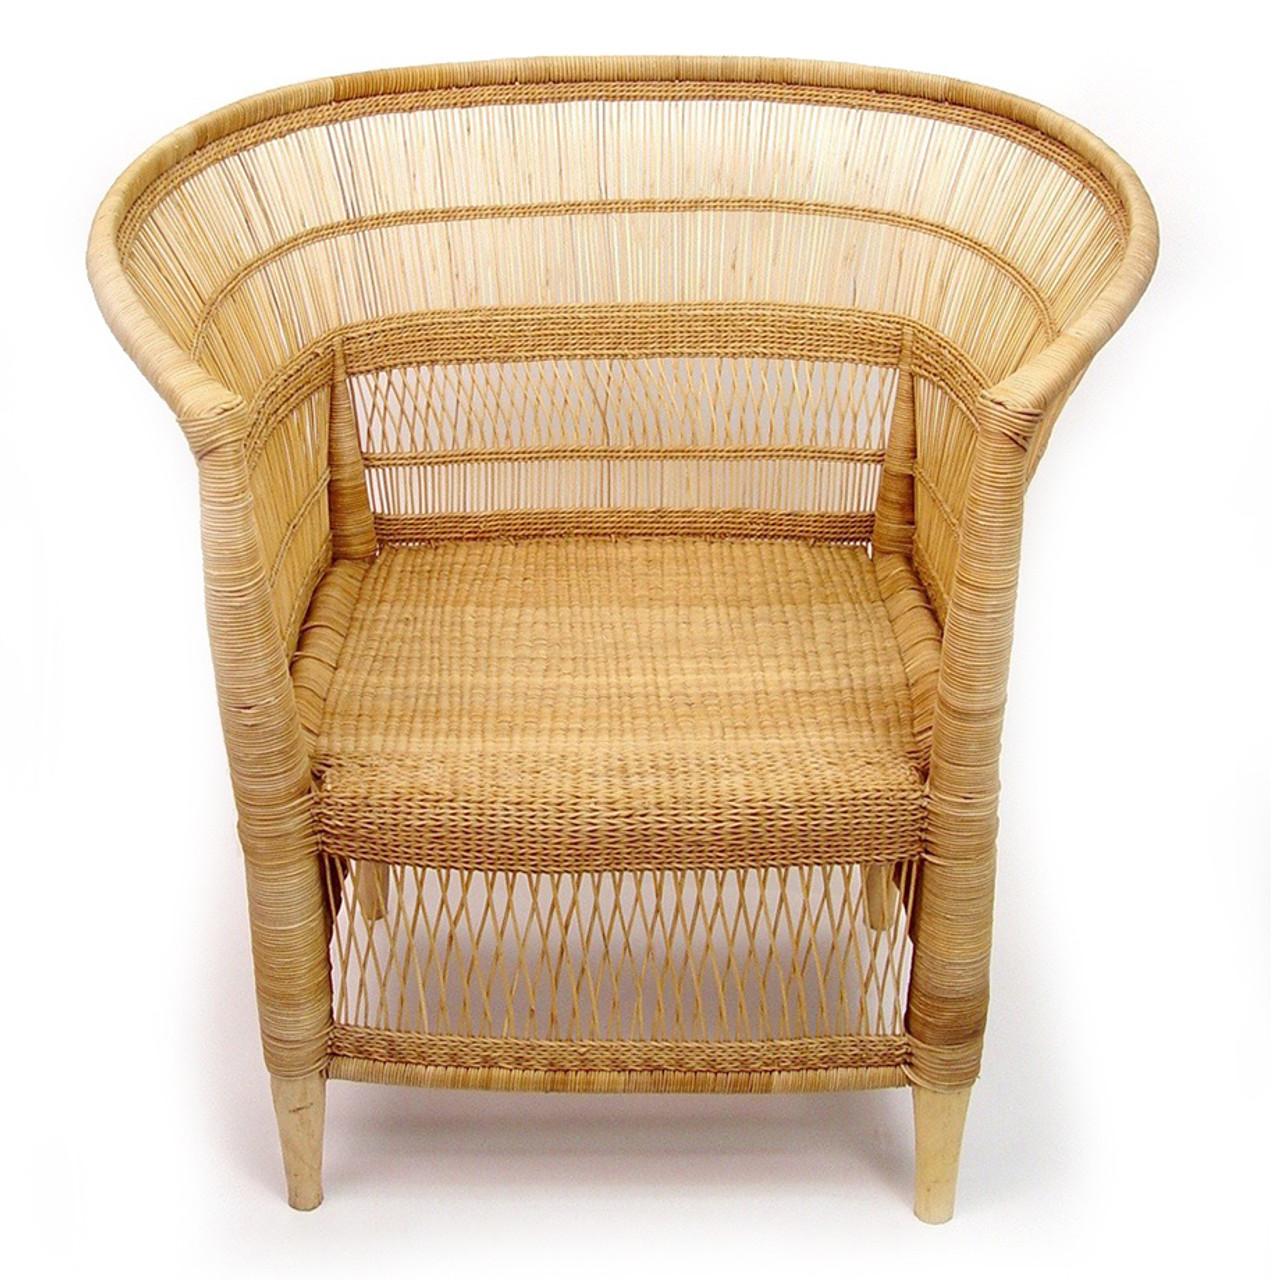 Fabulous Malawi Cane Chair Natural Inzonedesignstudio Interior Chair Design Inzonedesignstudiocom